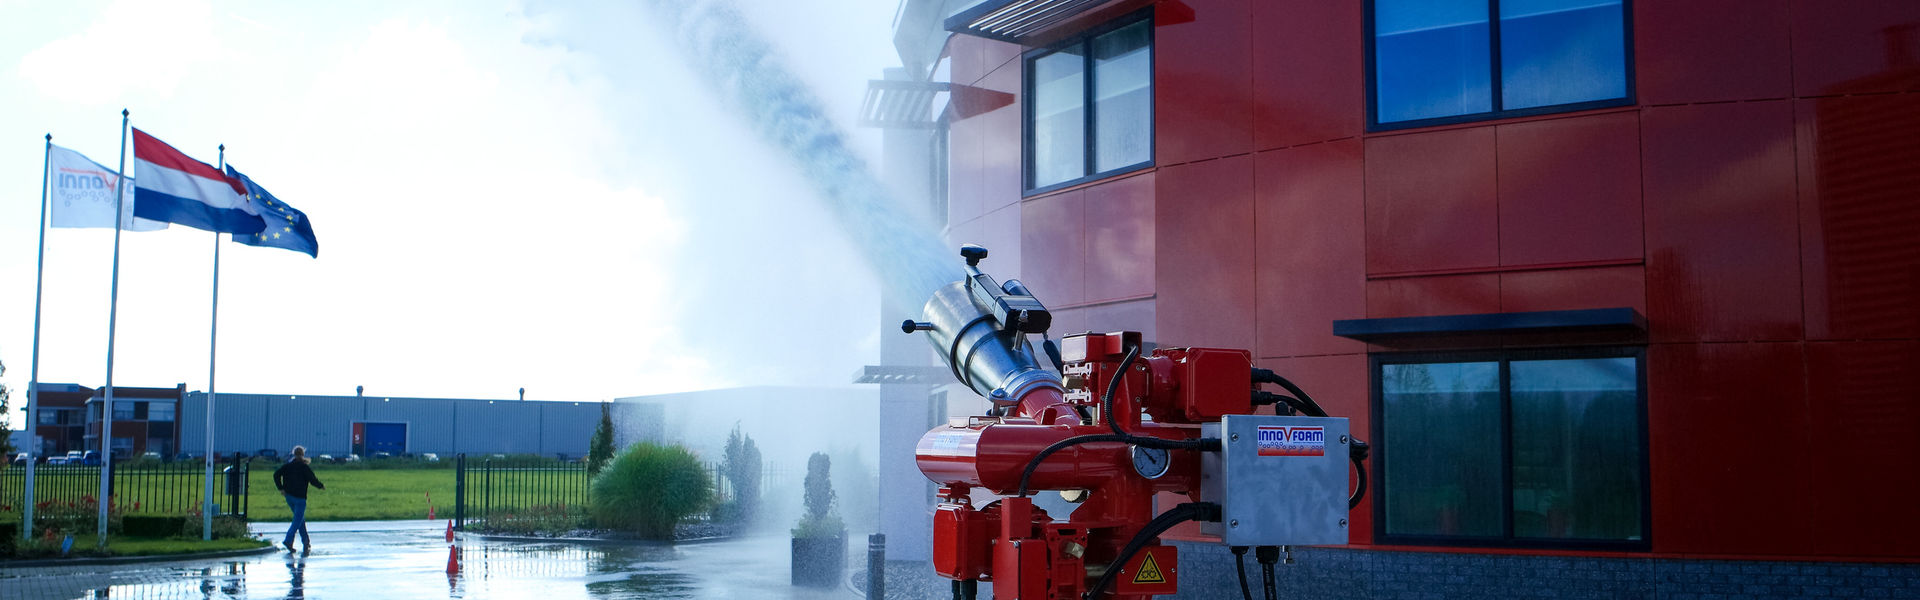 Innovfoam B.V. Schuimblussystemen en brandpreventie